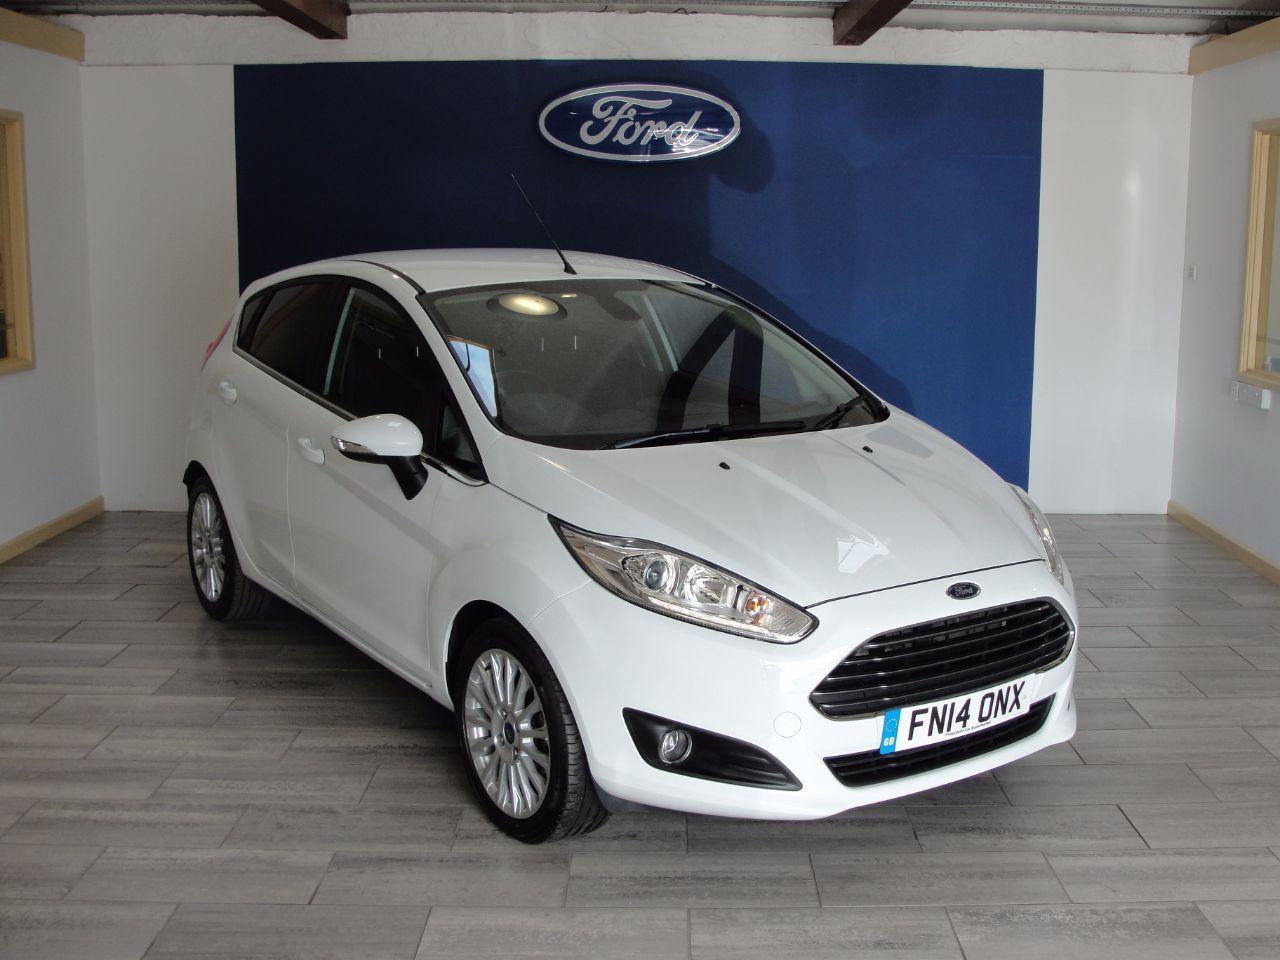 Ford Fiesta 1 0 Ecoboost Titanium 5dr Hatchback Petrol White